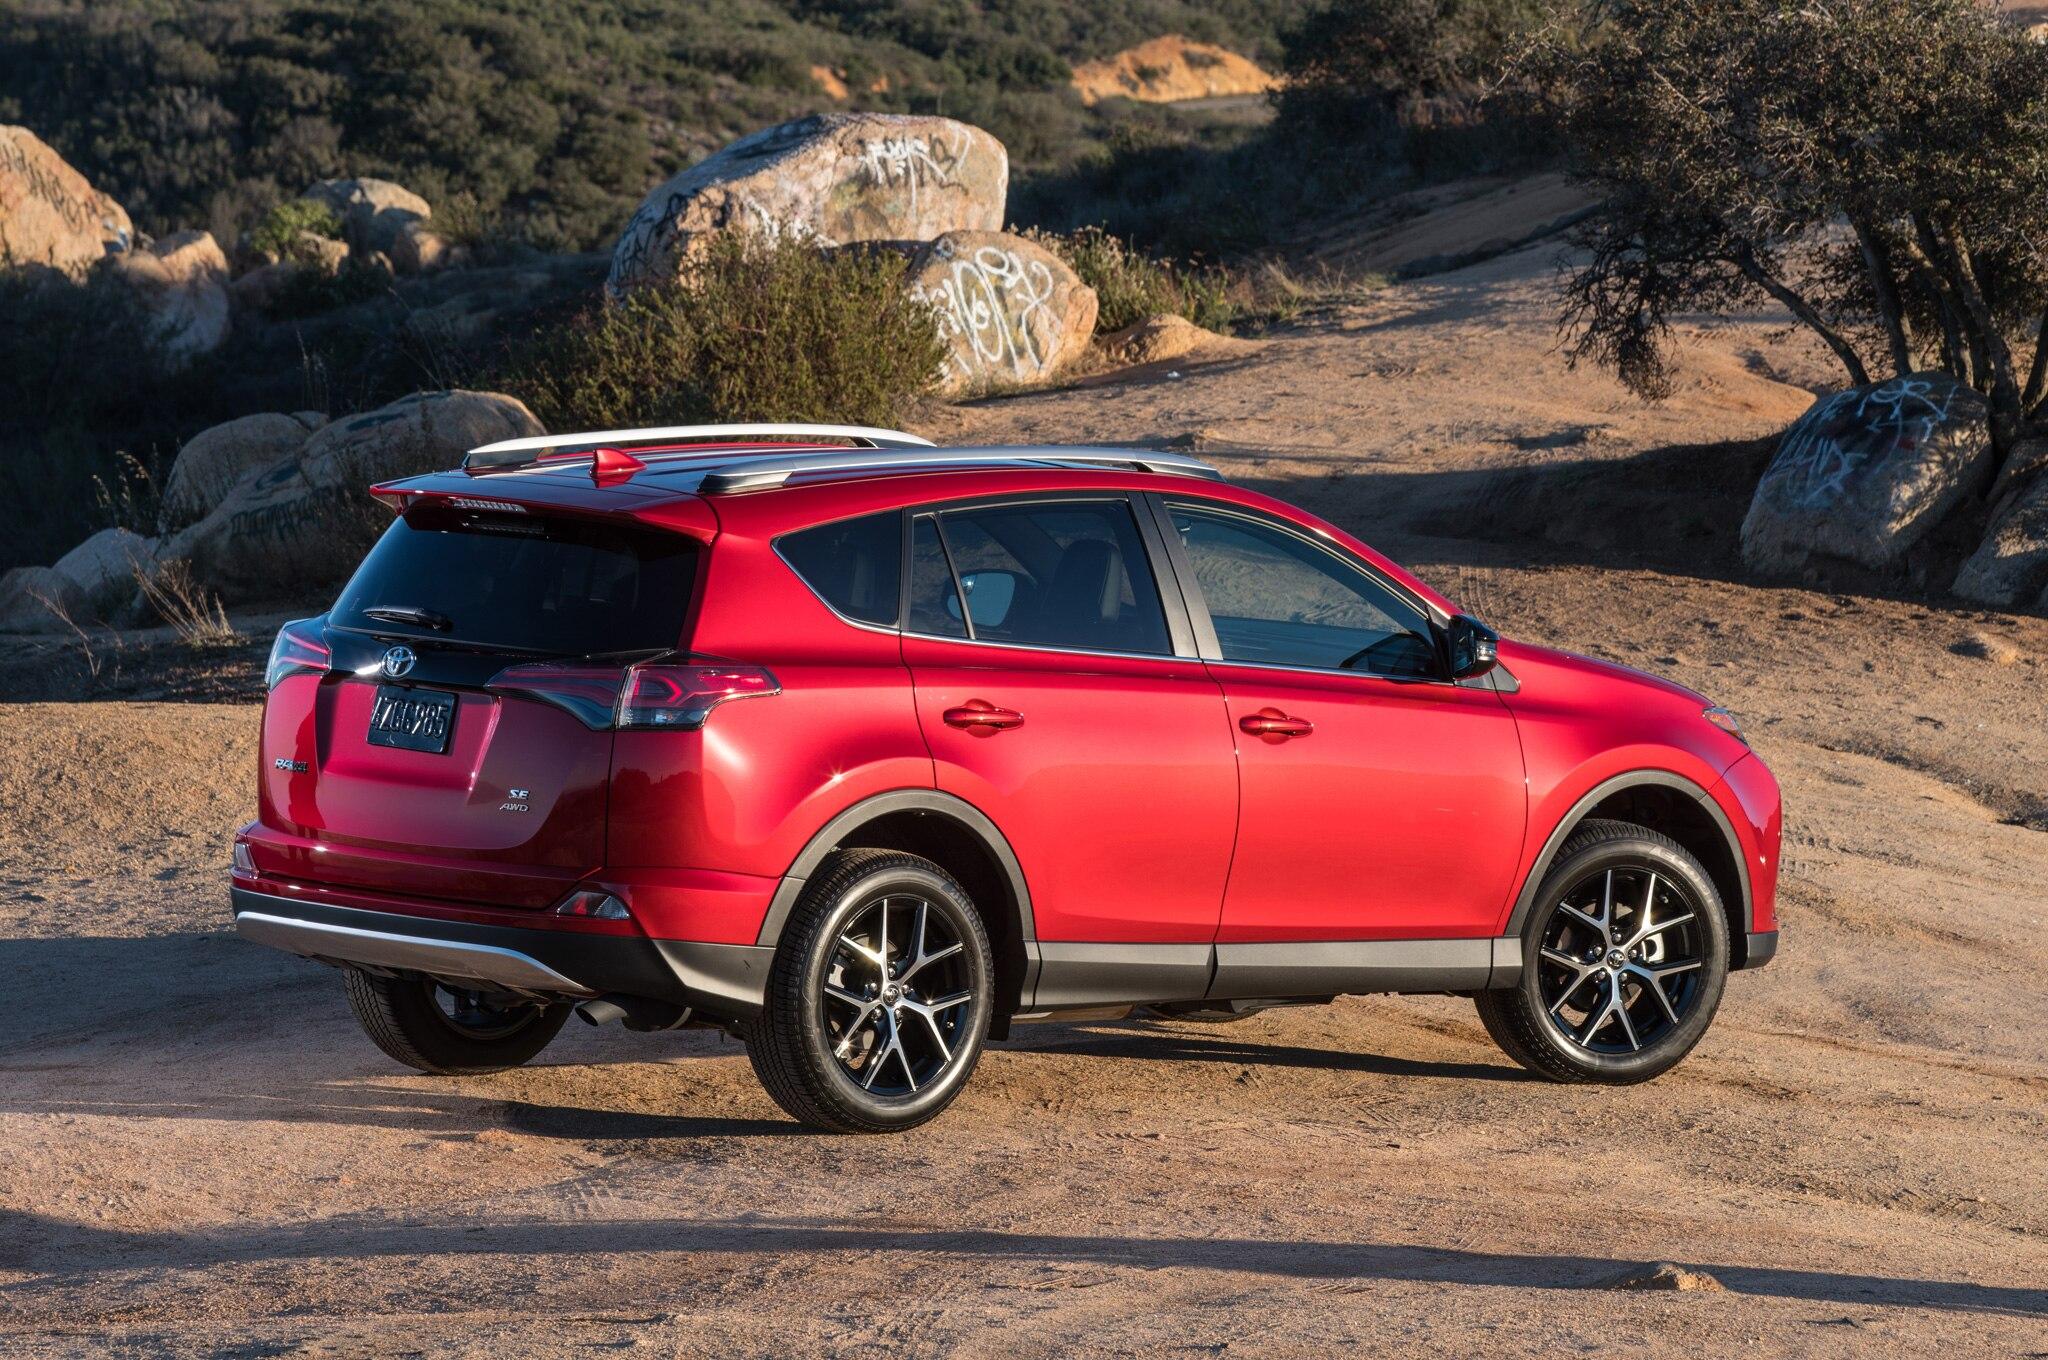 Toyota Rav4 Trd >> A Rally Inspired Toyota Rav4 Trd Is Coming Soon